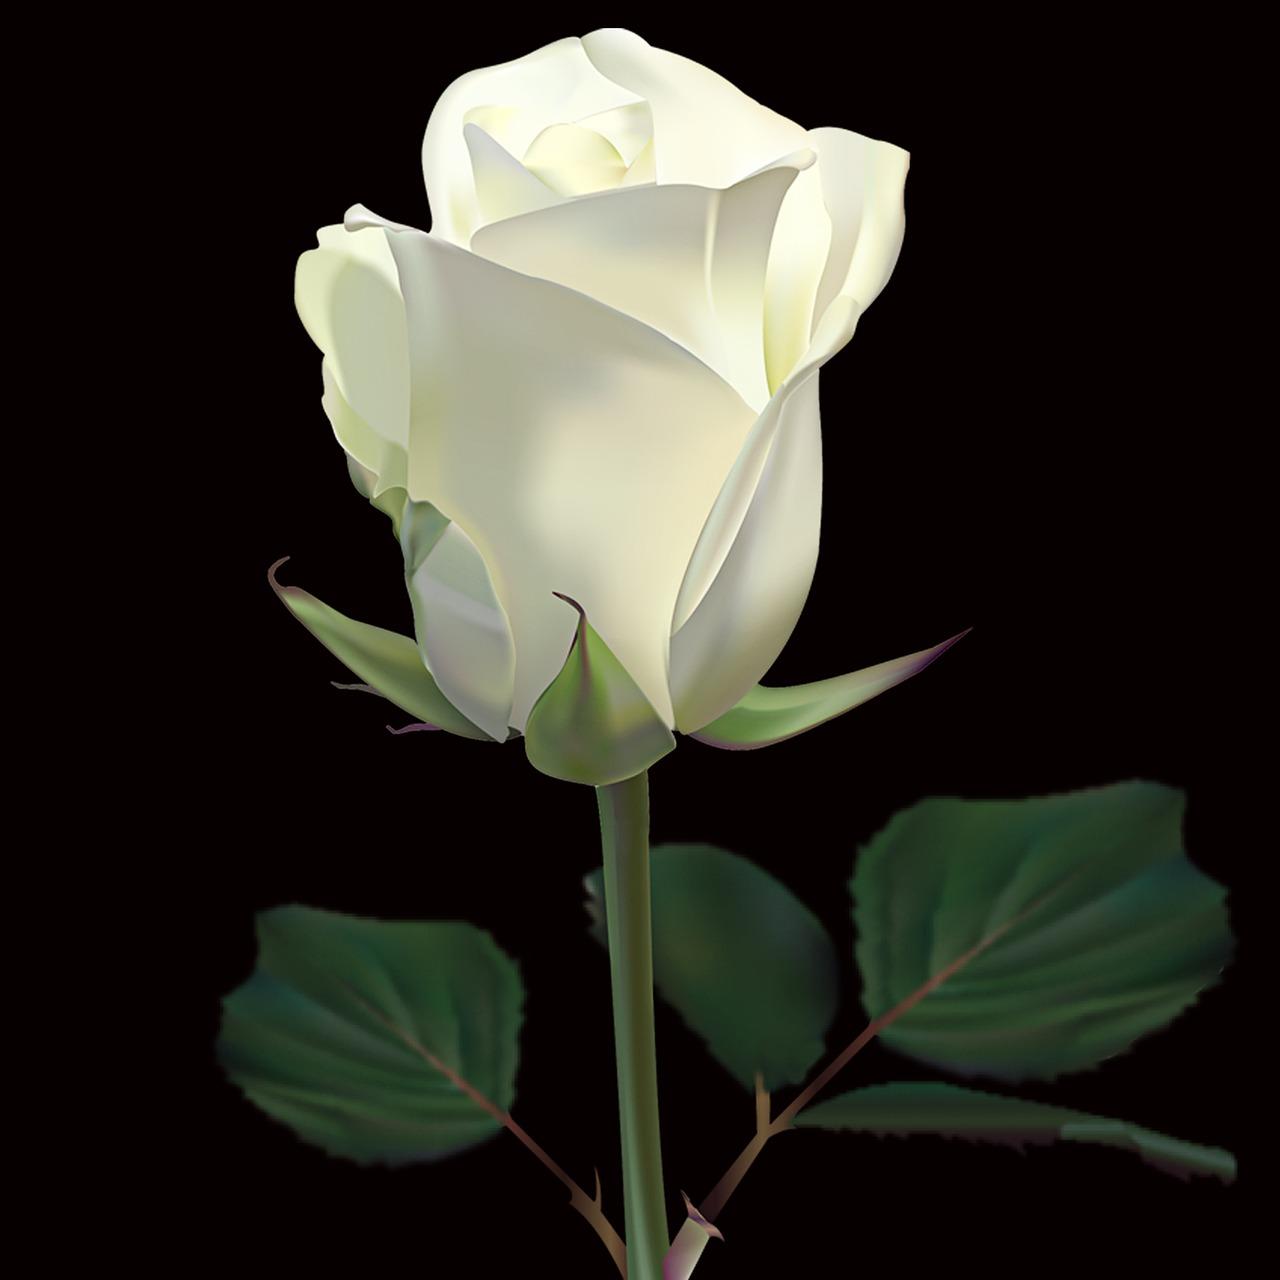 картинка белы бутон розы прикольных